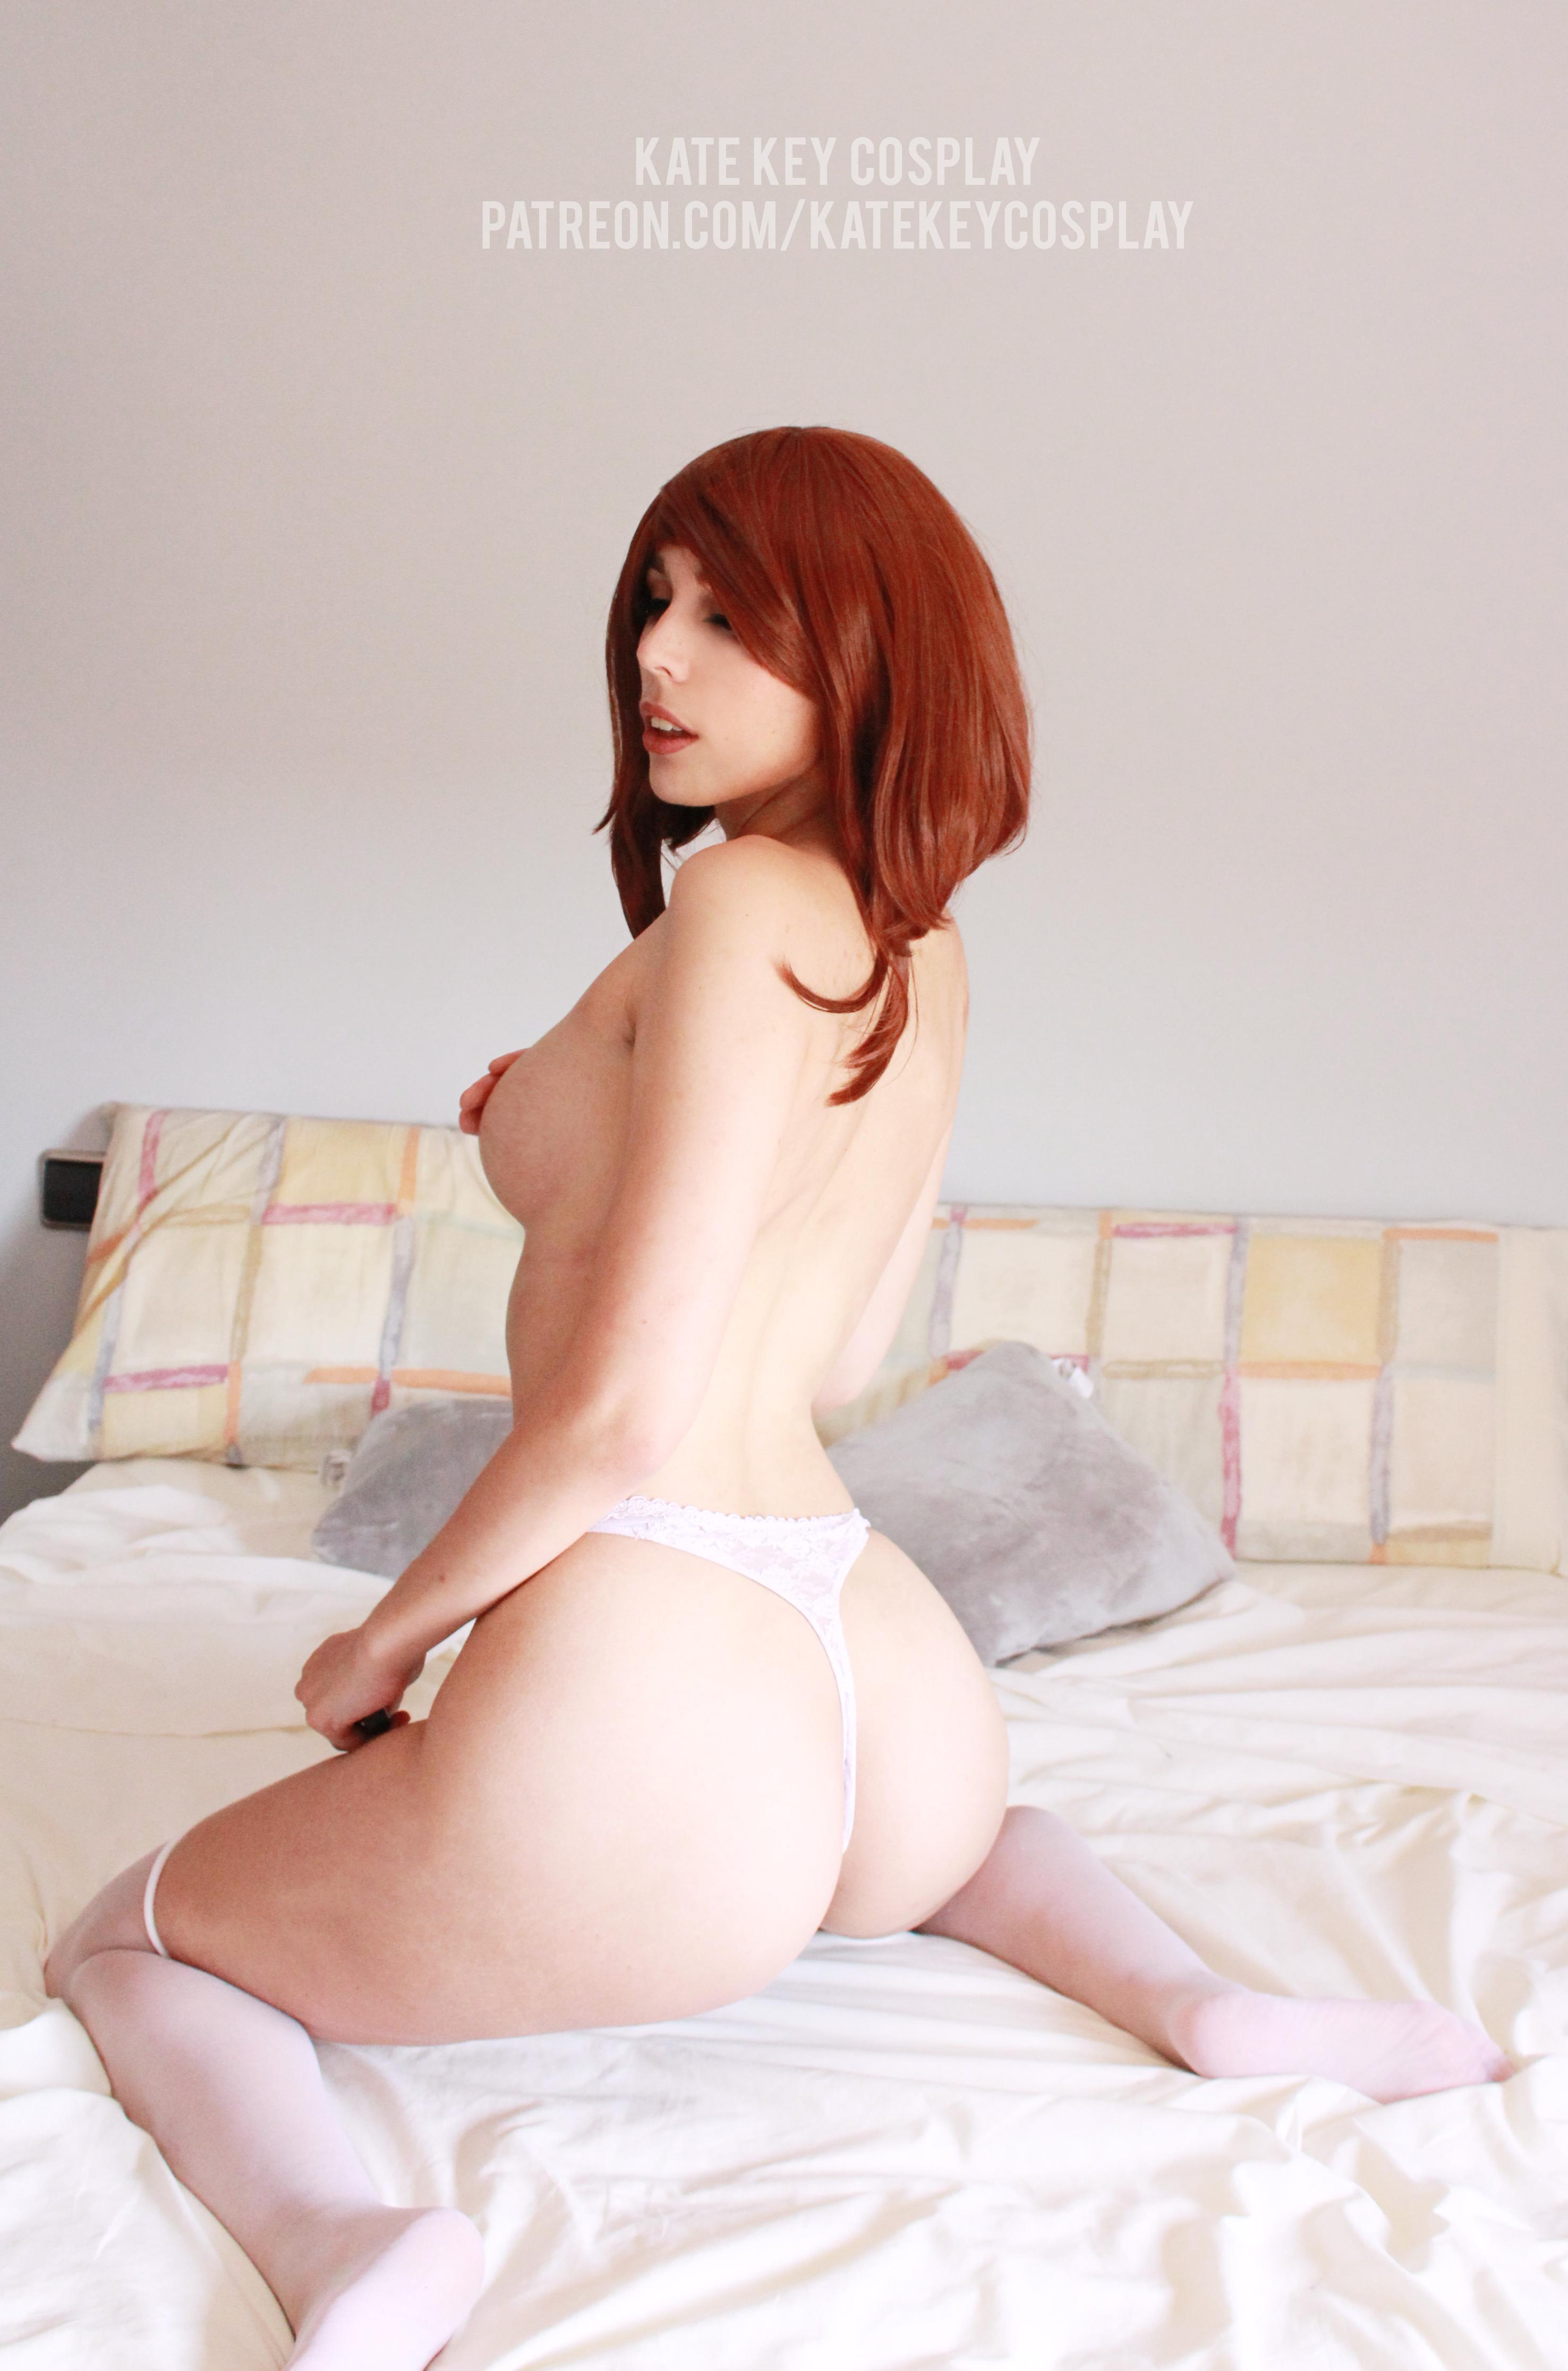 Uravity Booty! – By Kate Key